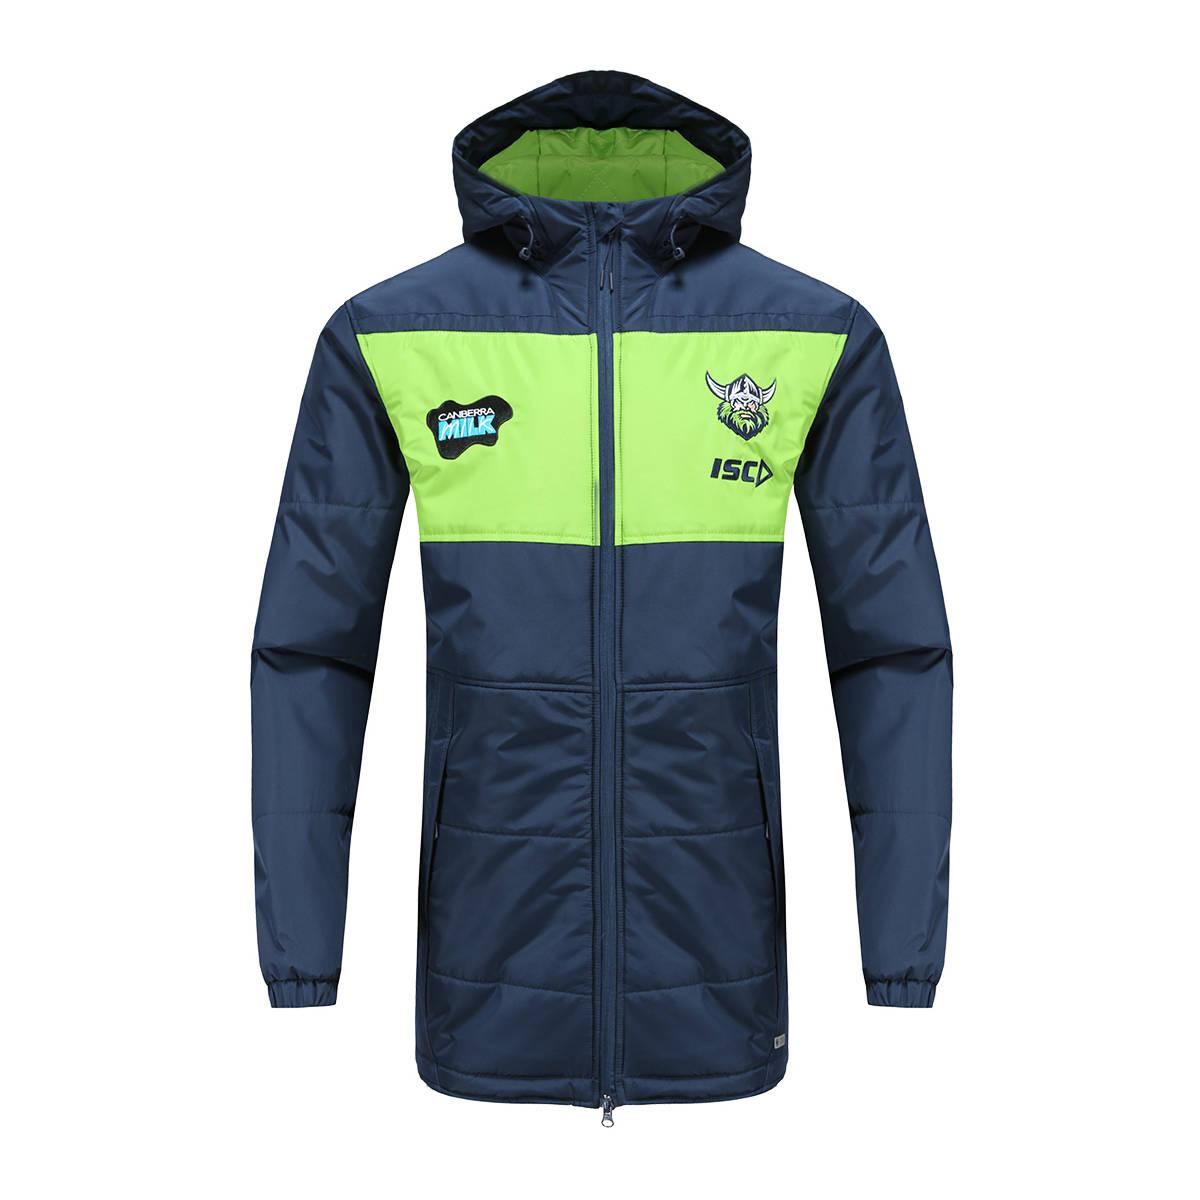 2021 Coaches Jacket0